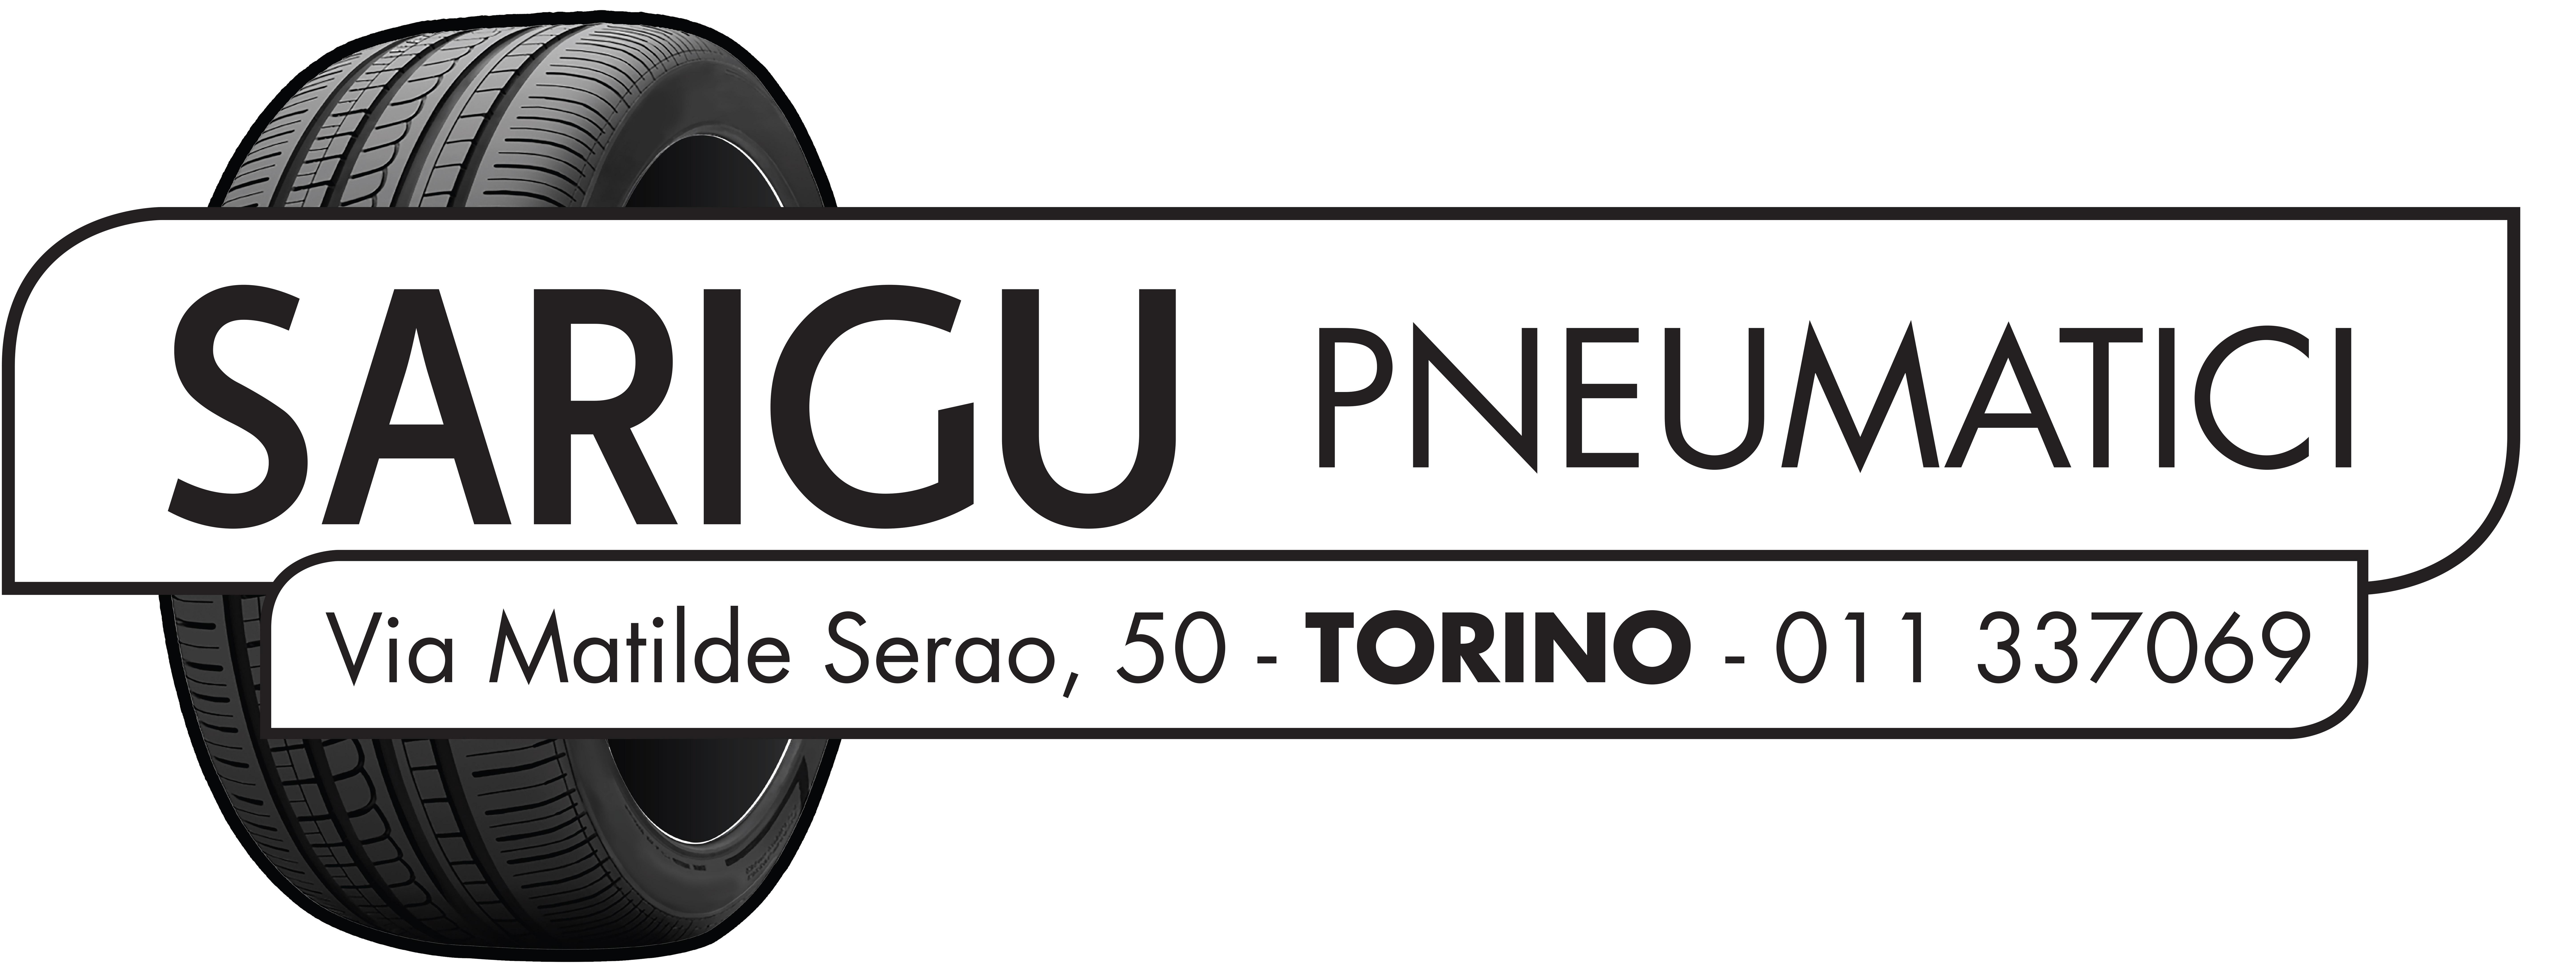 sarigu logo.indd